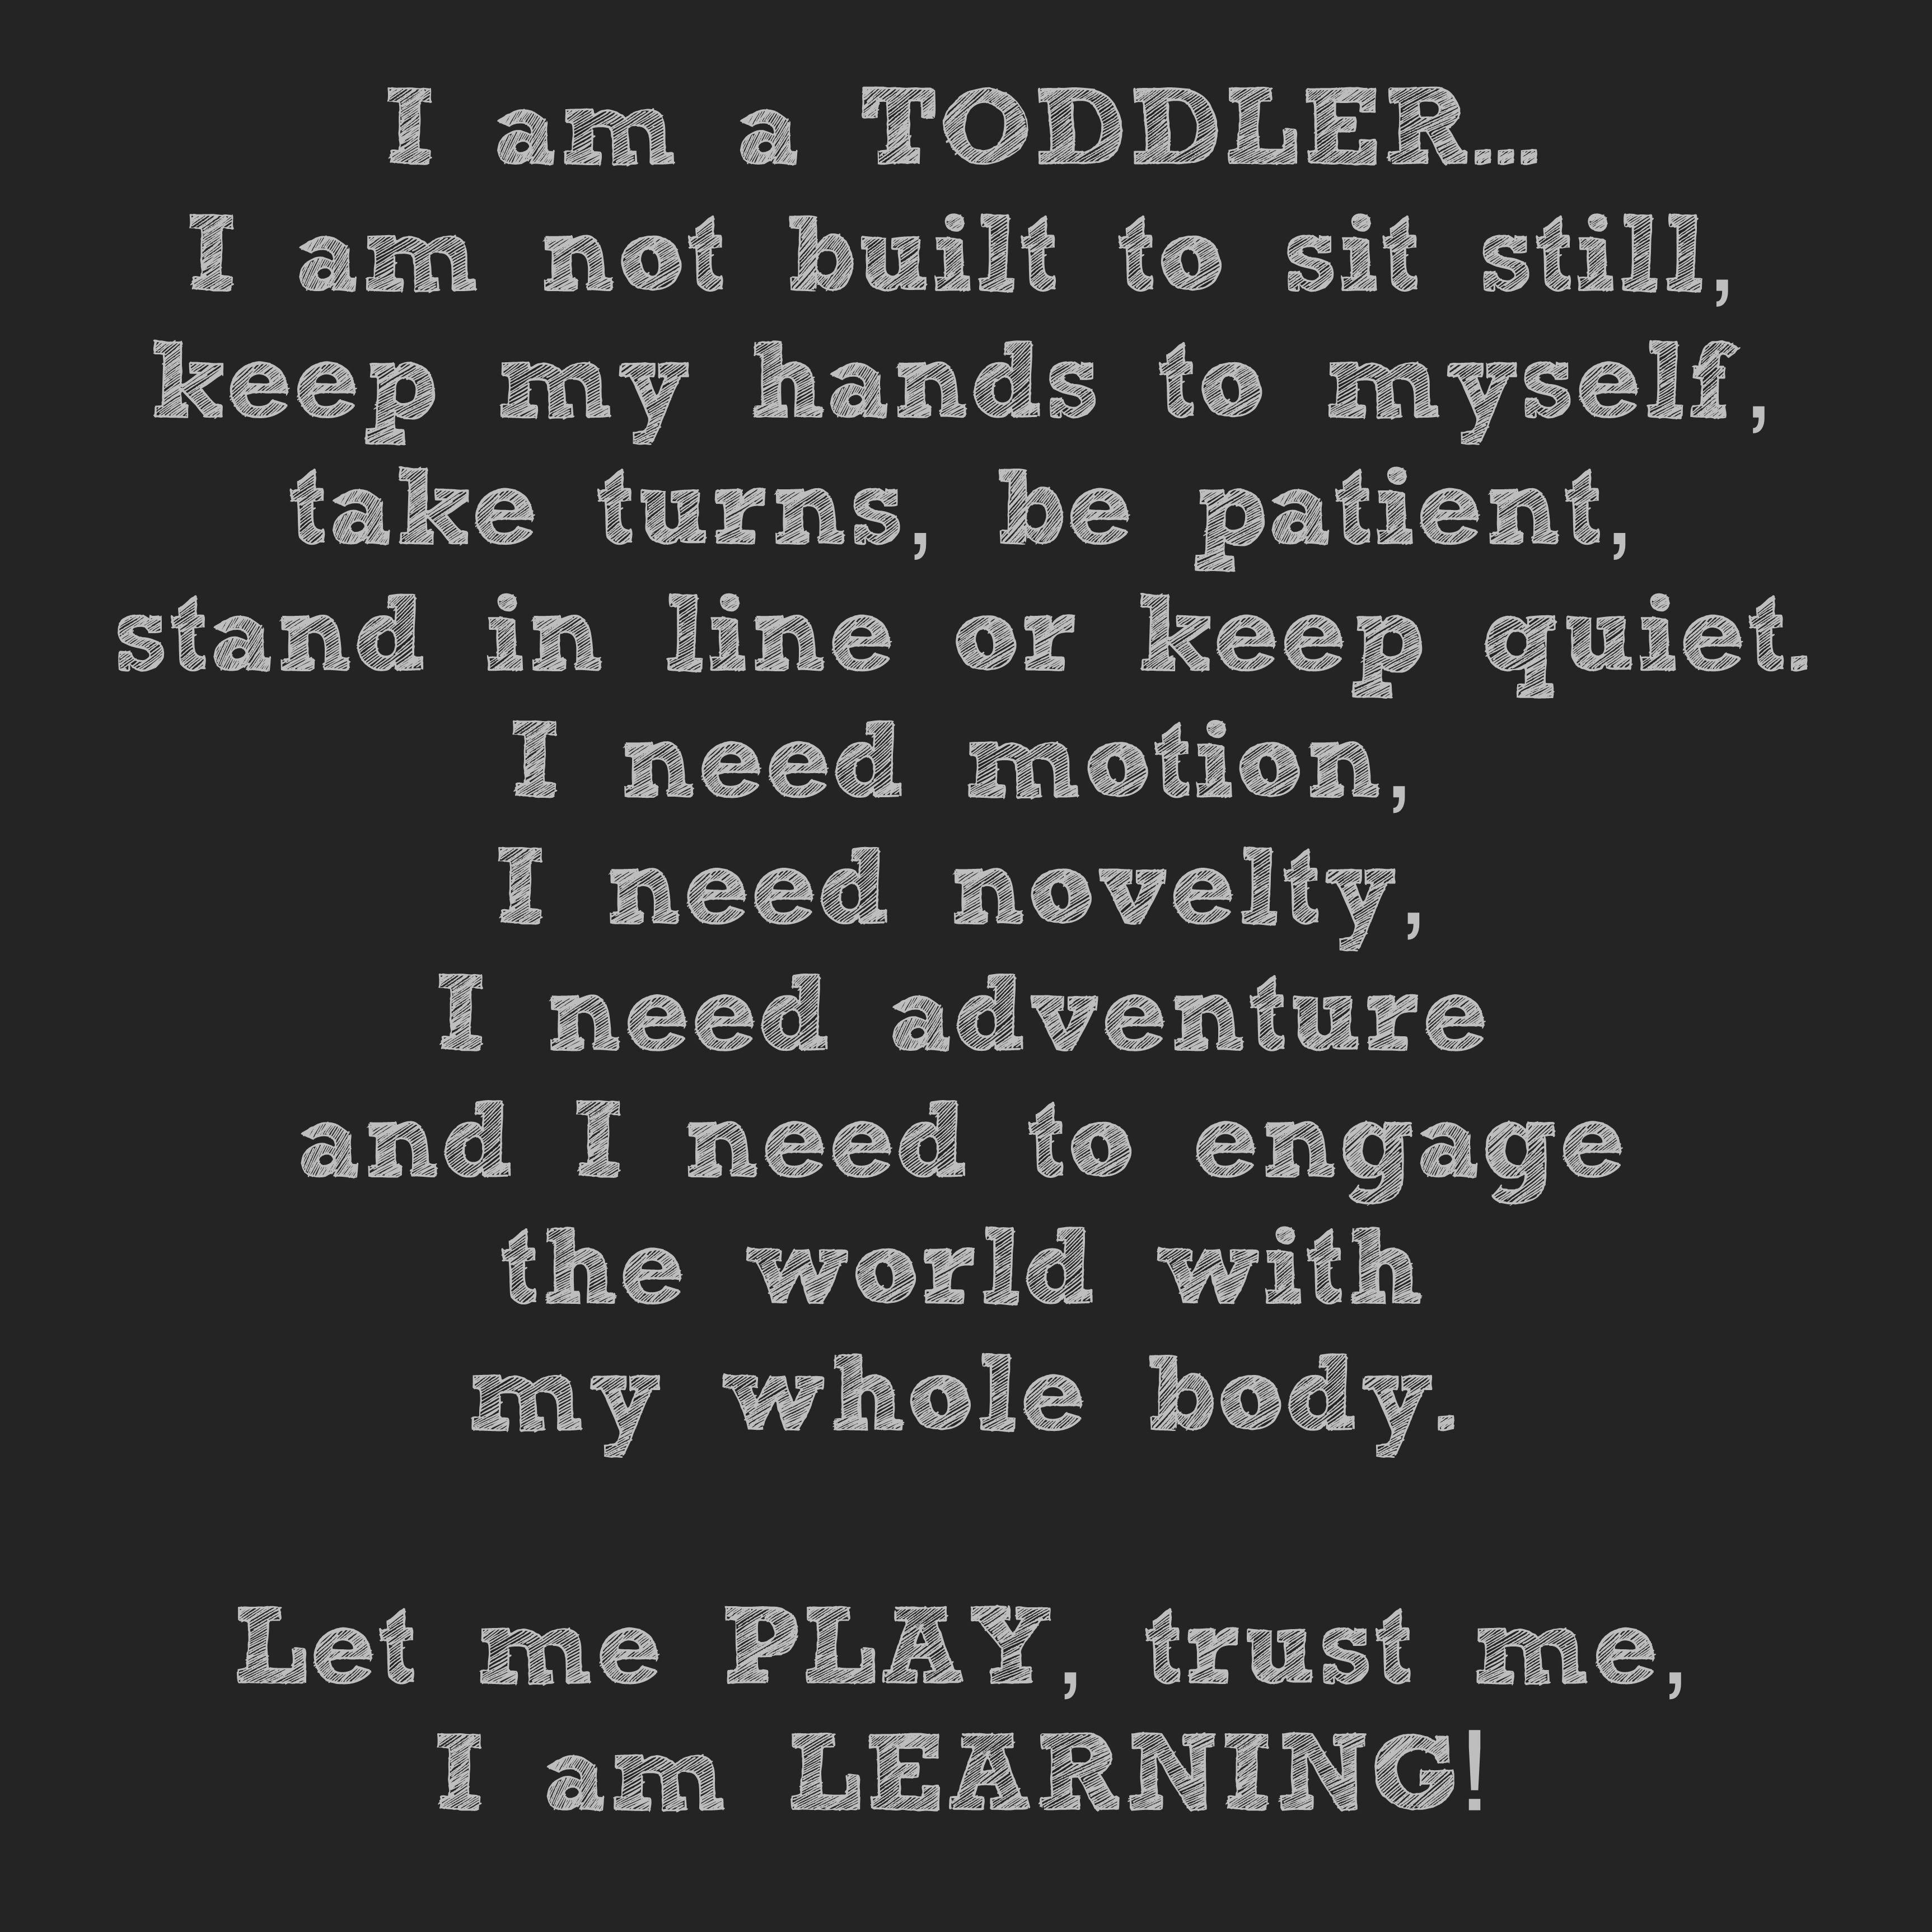 Toddler Classroom Quotes Quotesgram Toddler Classroom Toddler Quotes Classroom Quotes